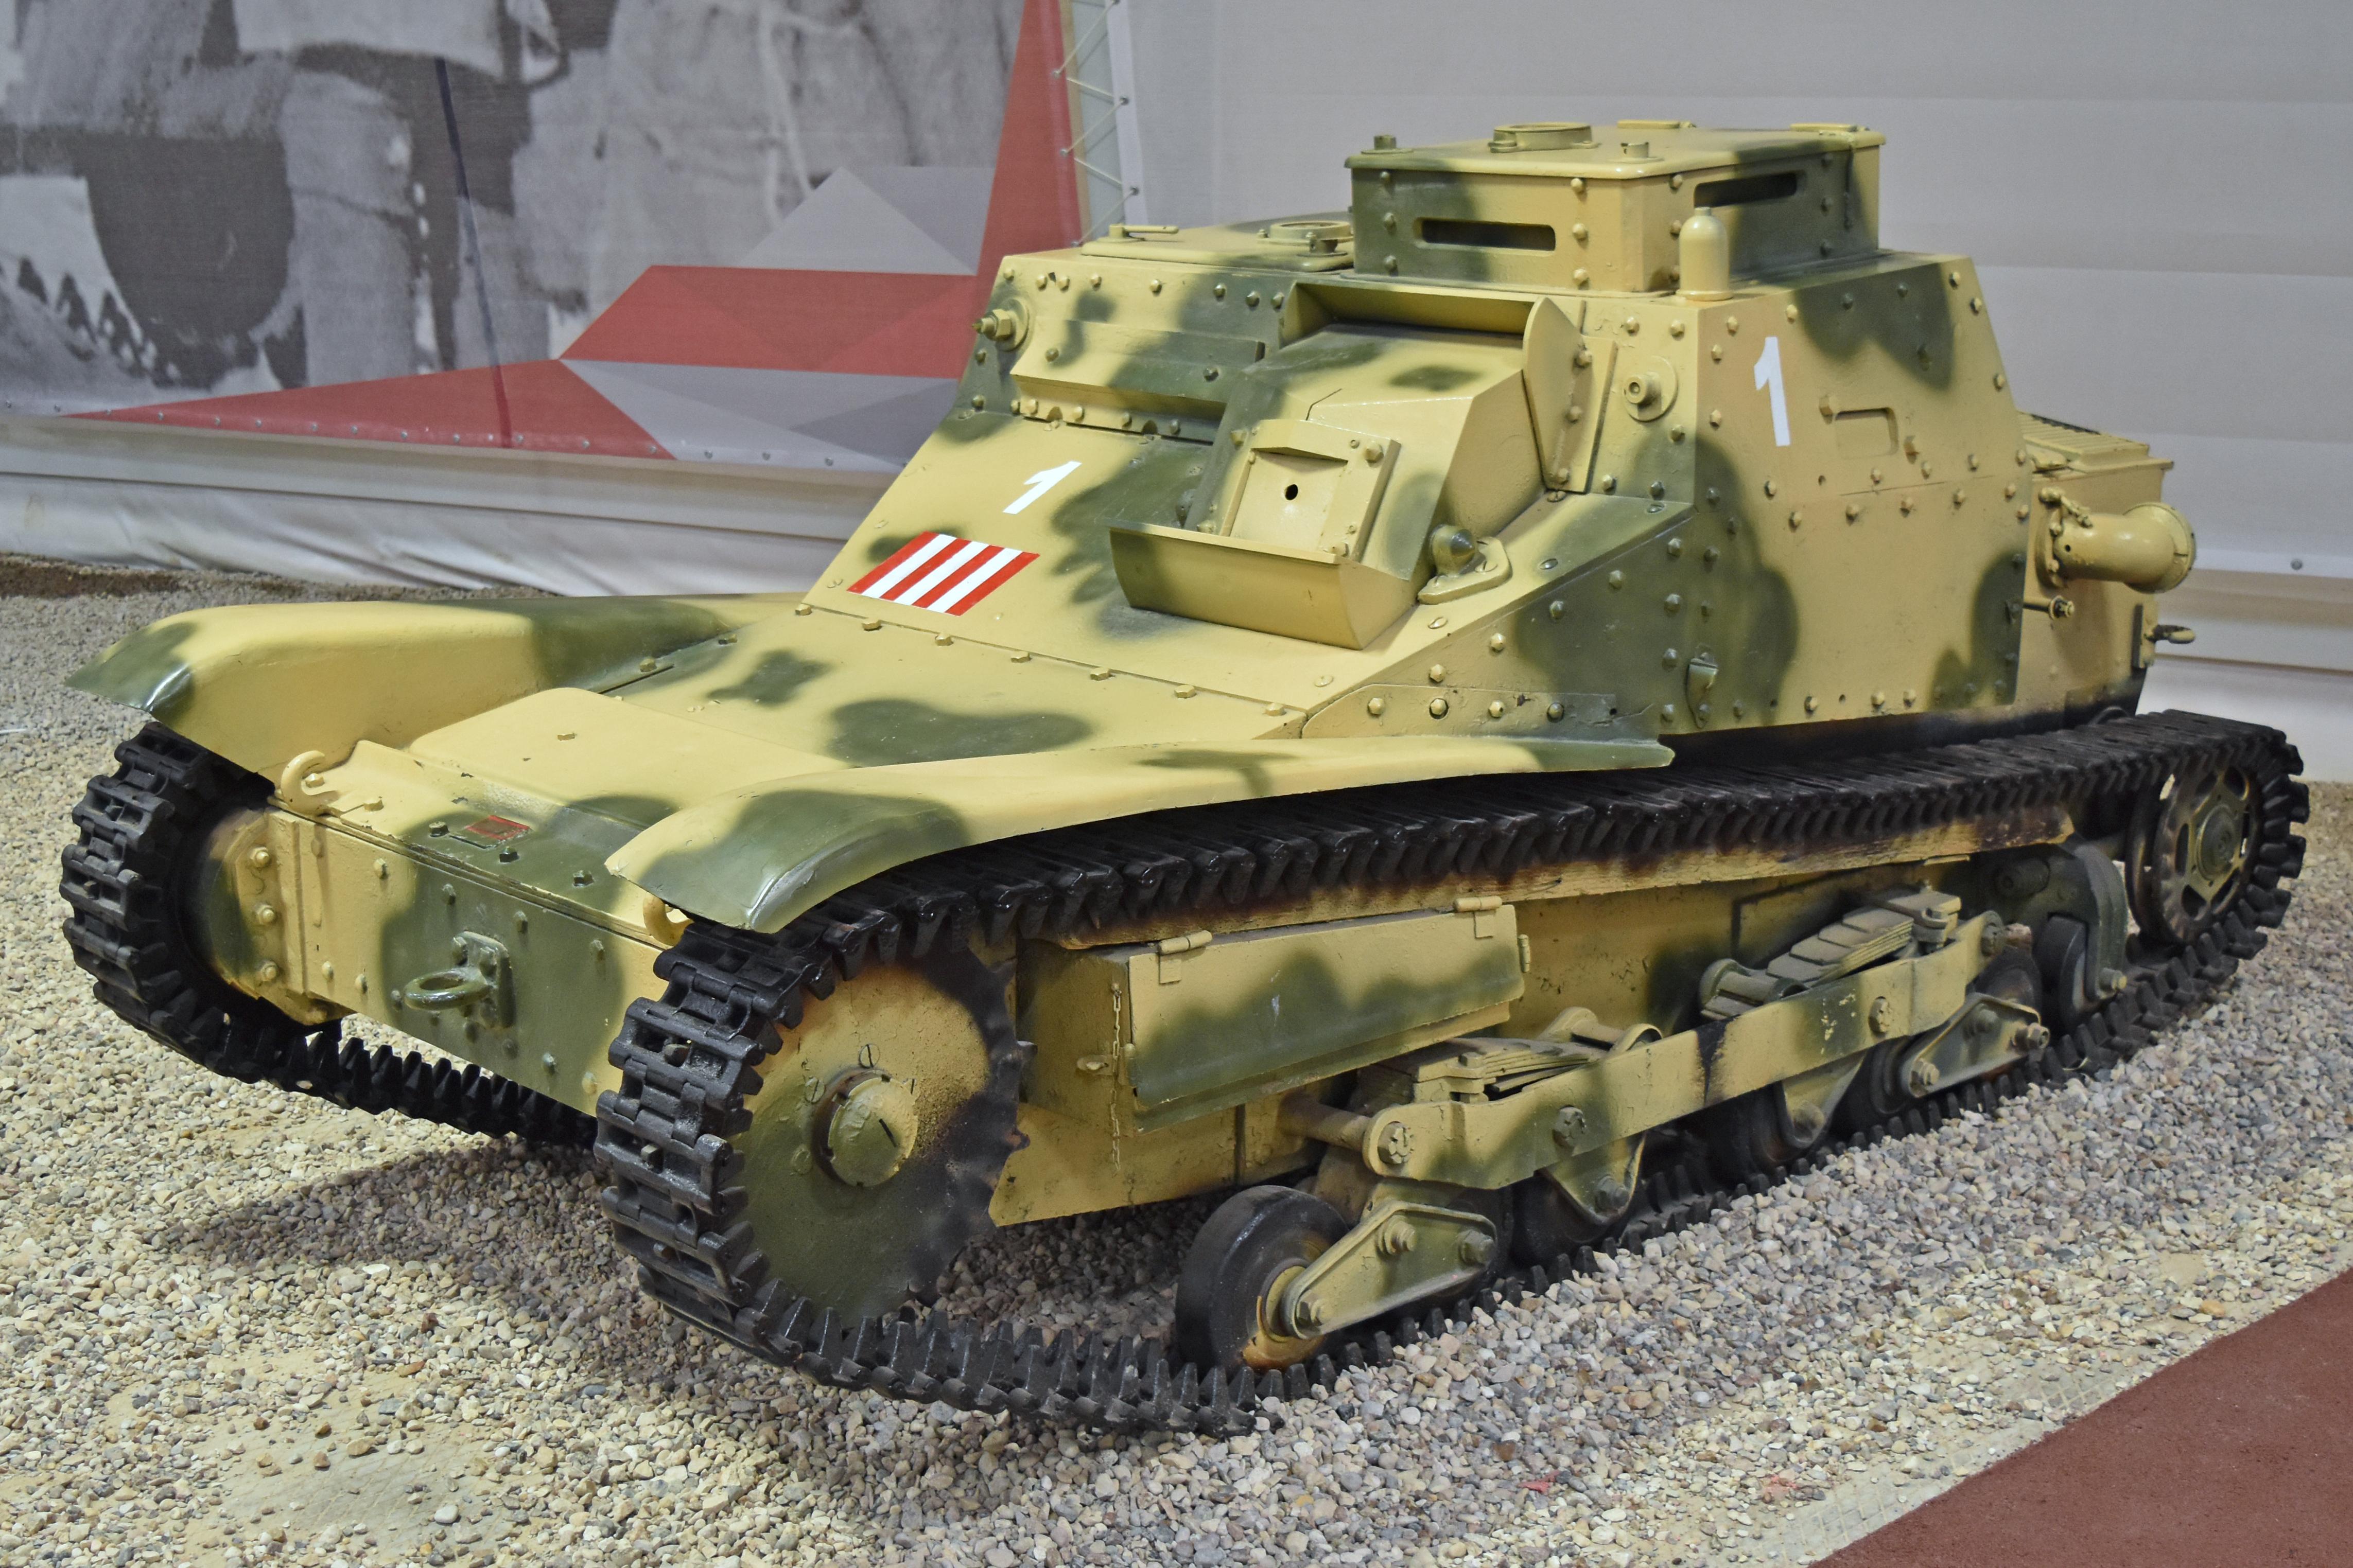 FileCarro Veloce CV 35 L3 35 Patriot Museum